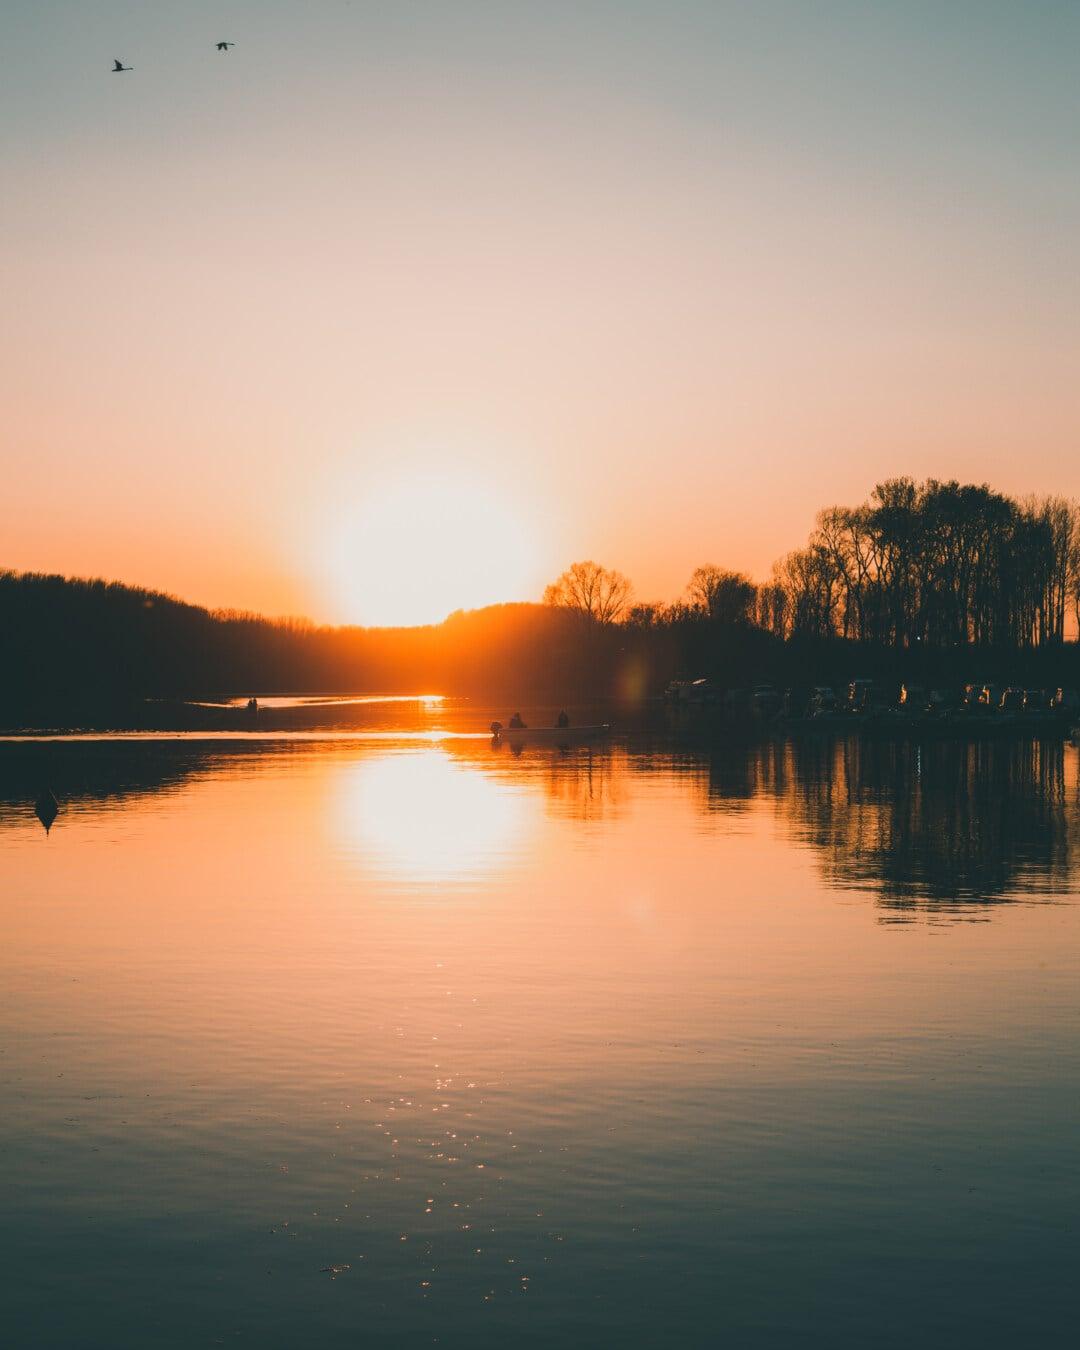 shore, sun, sunset, lakeside, dawn, lake, reflection, water, landscape, evening